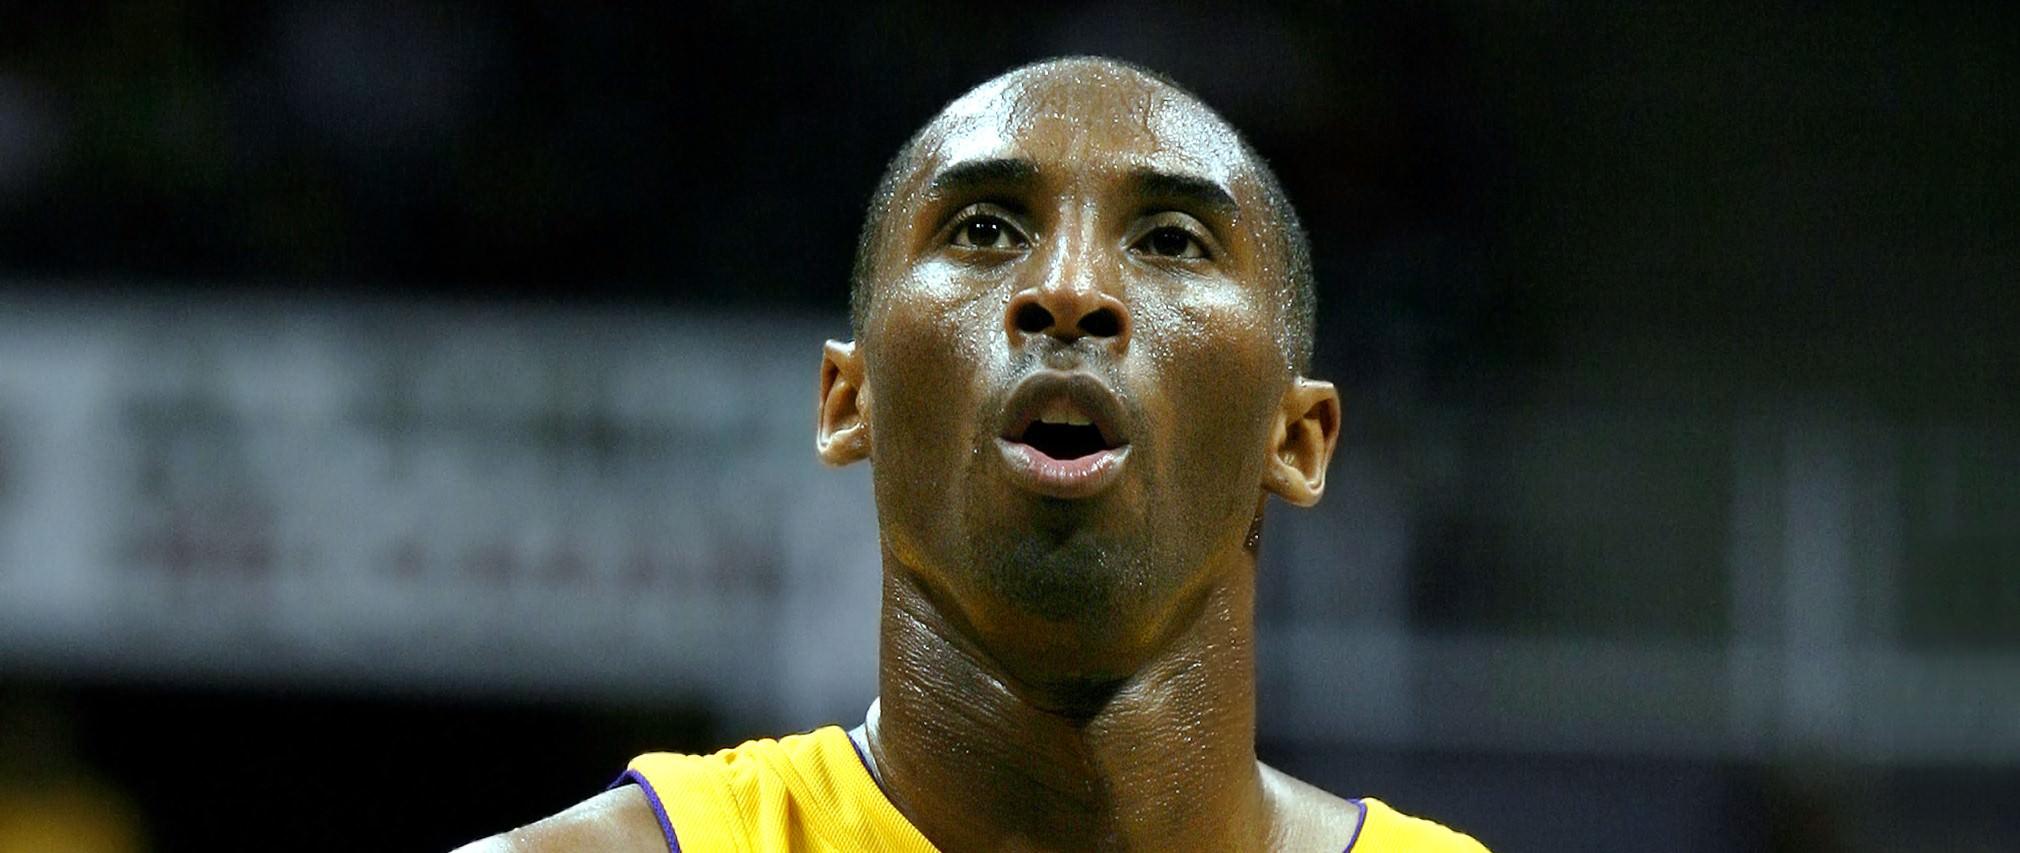 Kobe Bryant biography